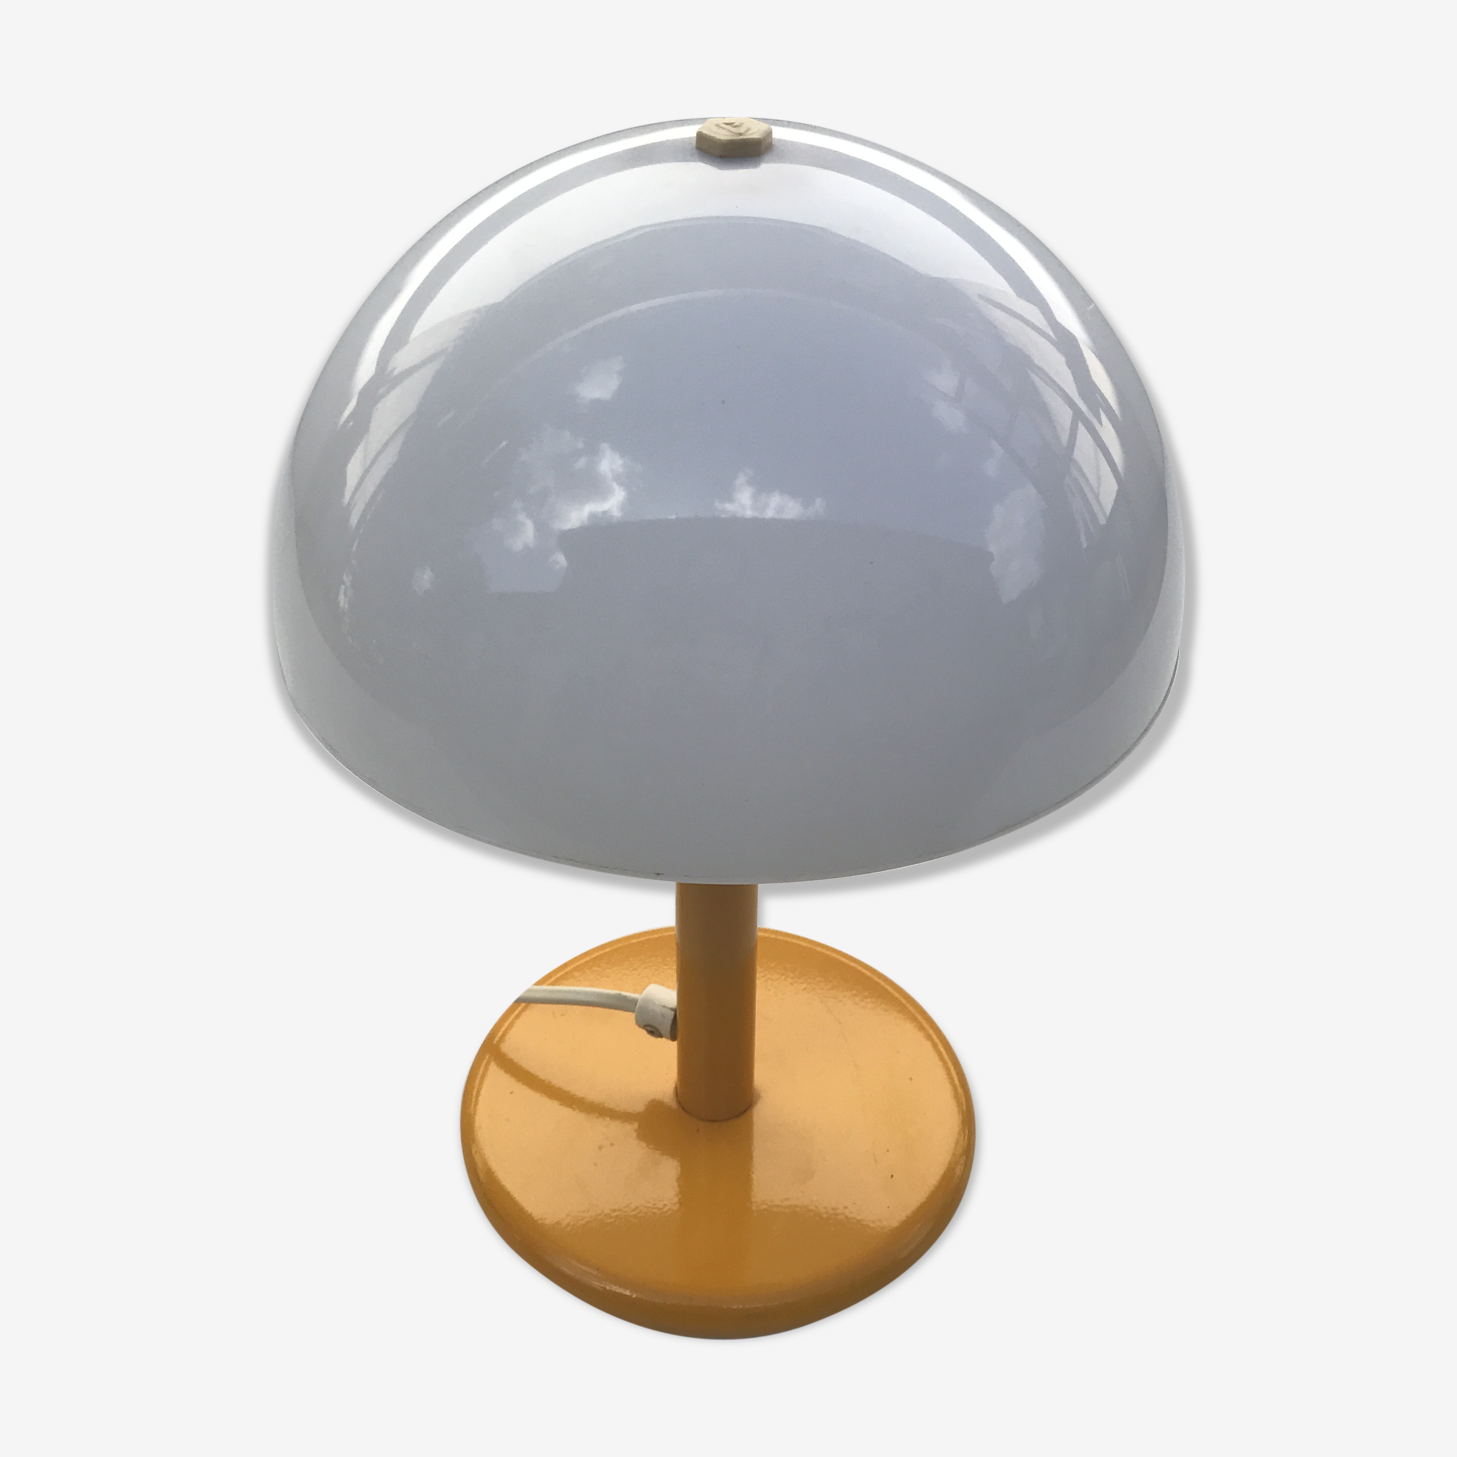 Lampe Champignon Aluminor Des Annees 70 Vintage Metal Yellow